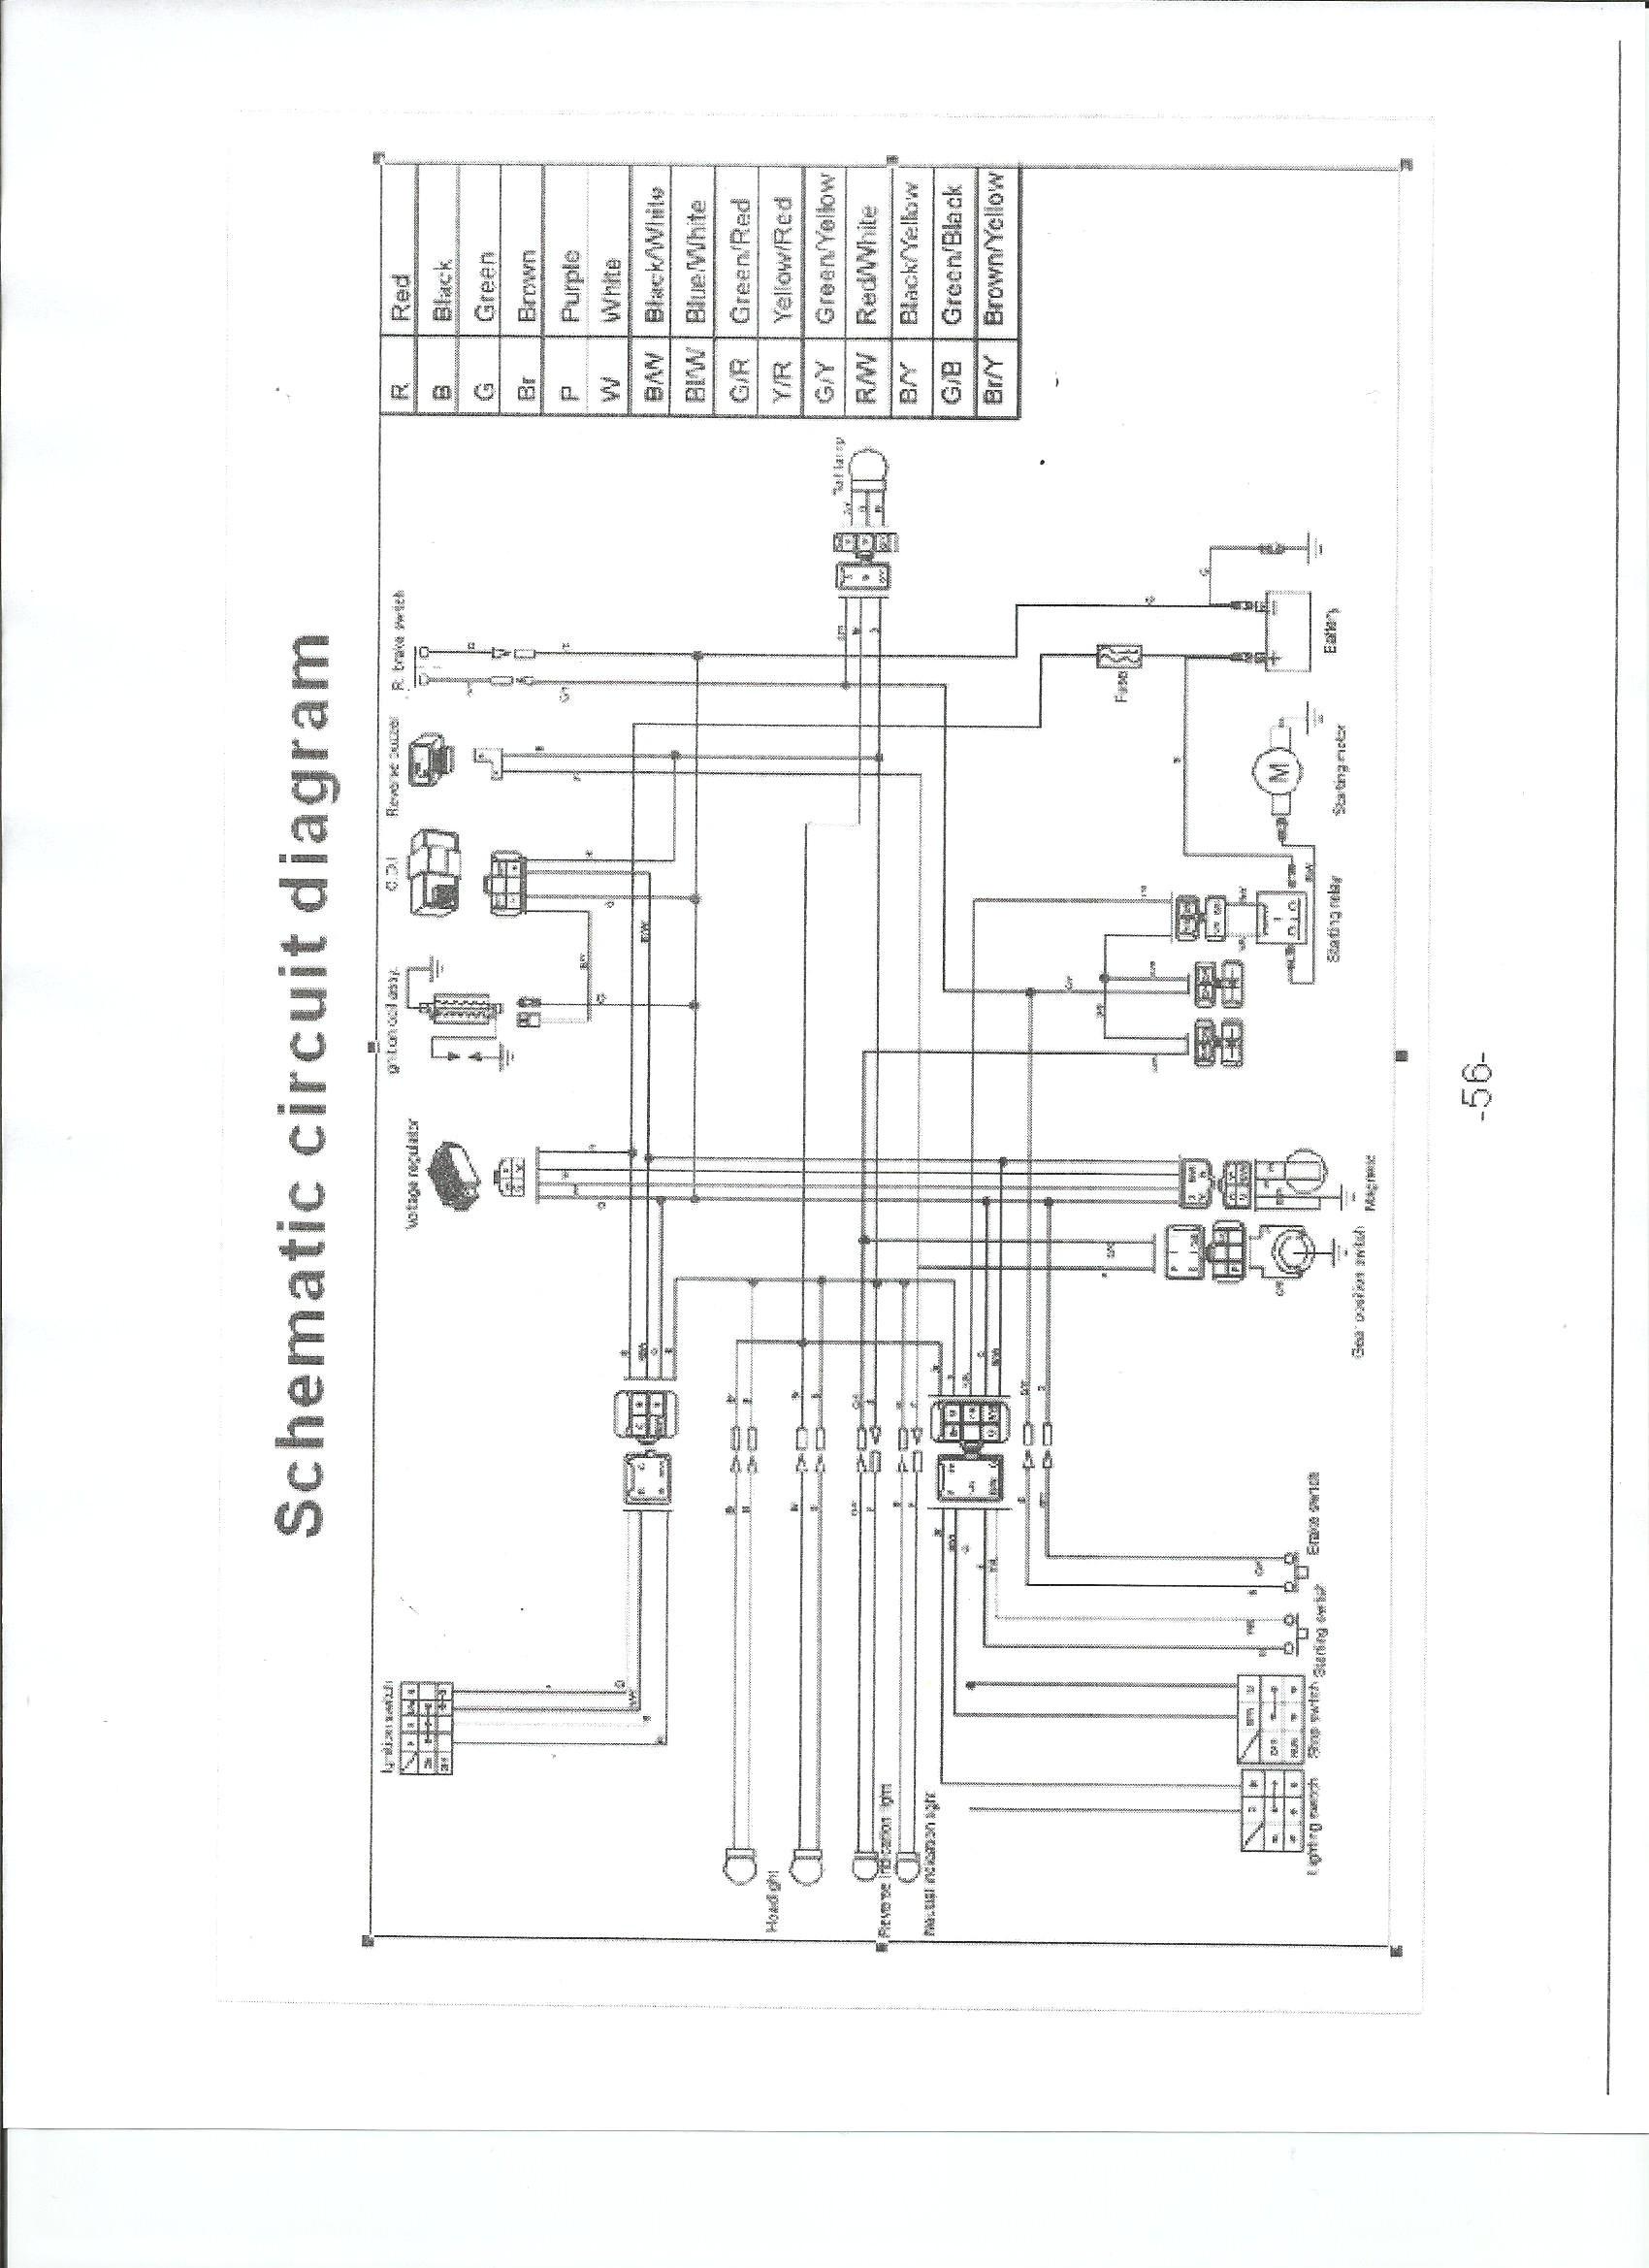 wiring diagrams for sunl quad 110